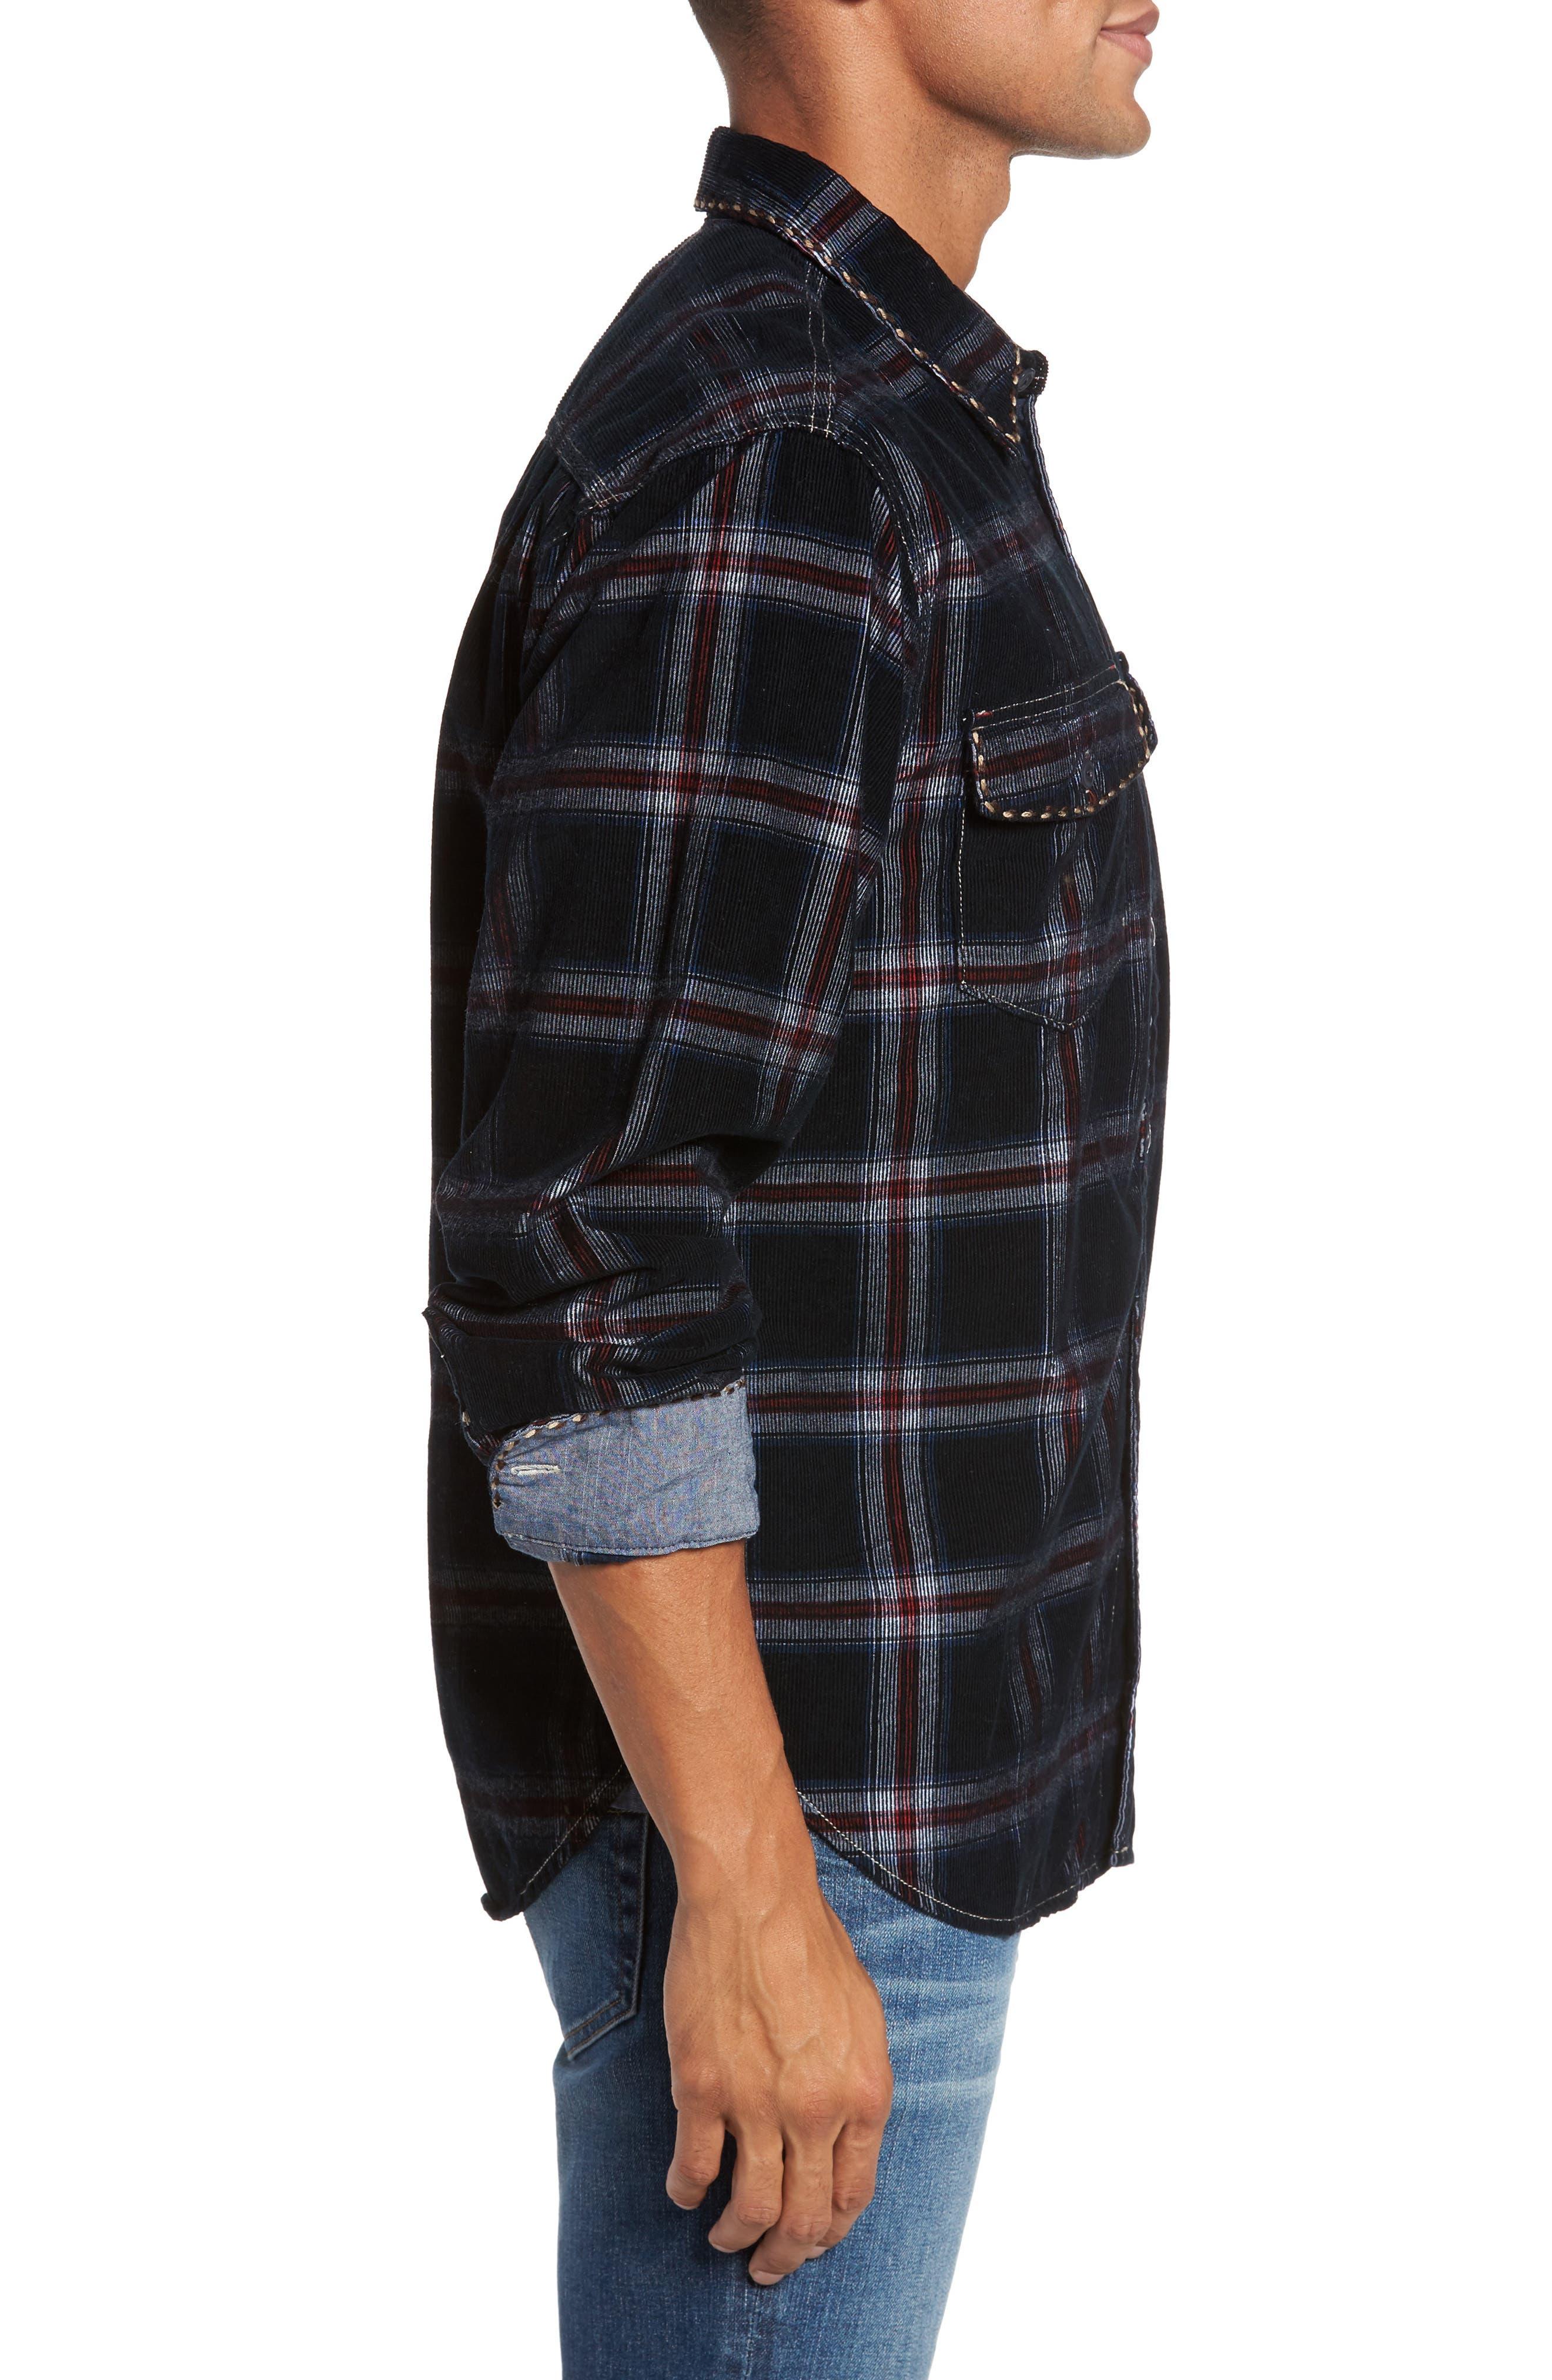 Summit Hunter Plaid Faux Shearling Lined Shirt Jacket,                             Alternate thumbnail 3, color,                             001